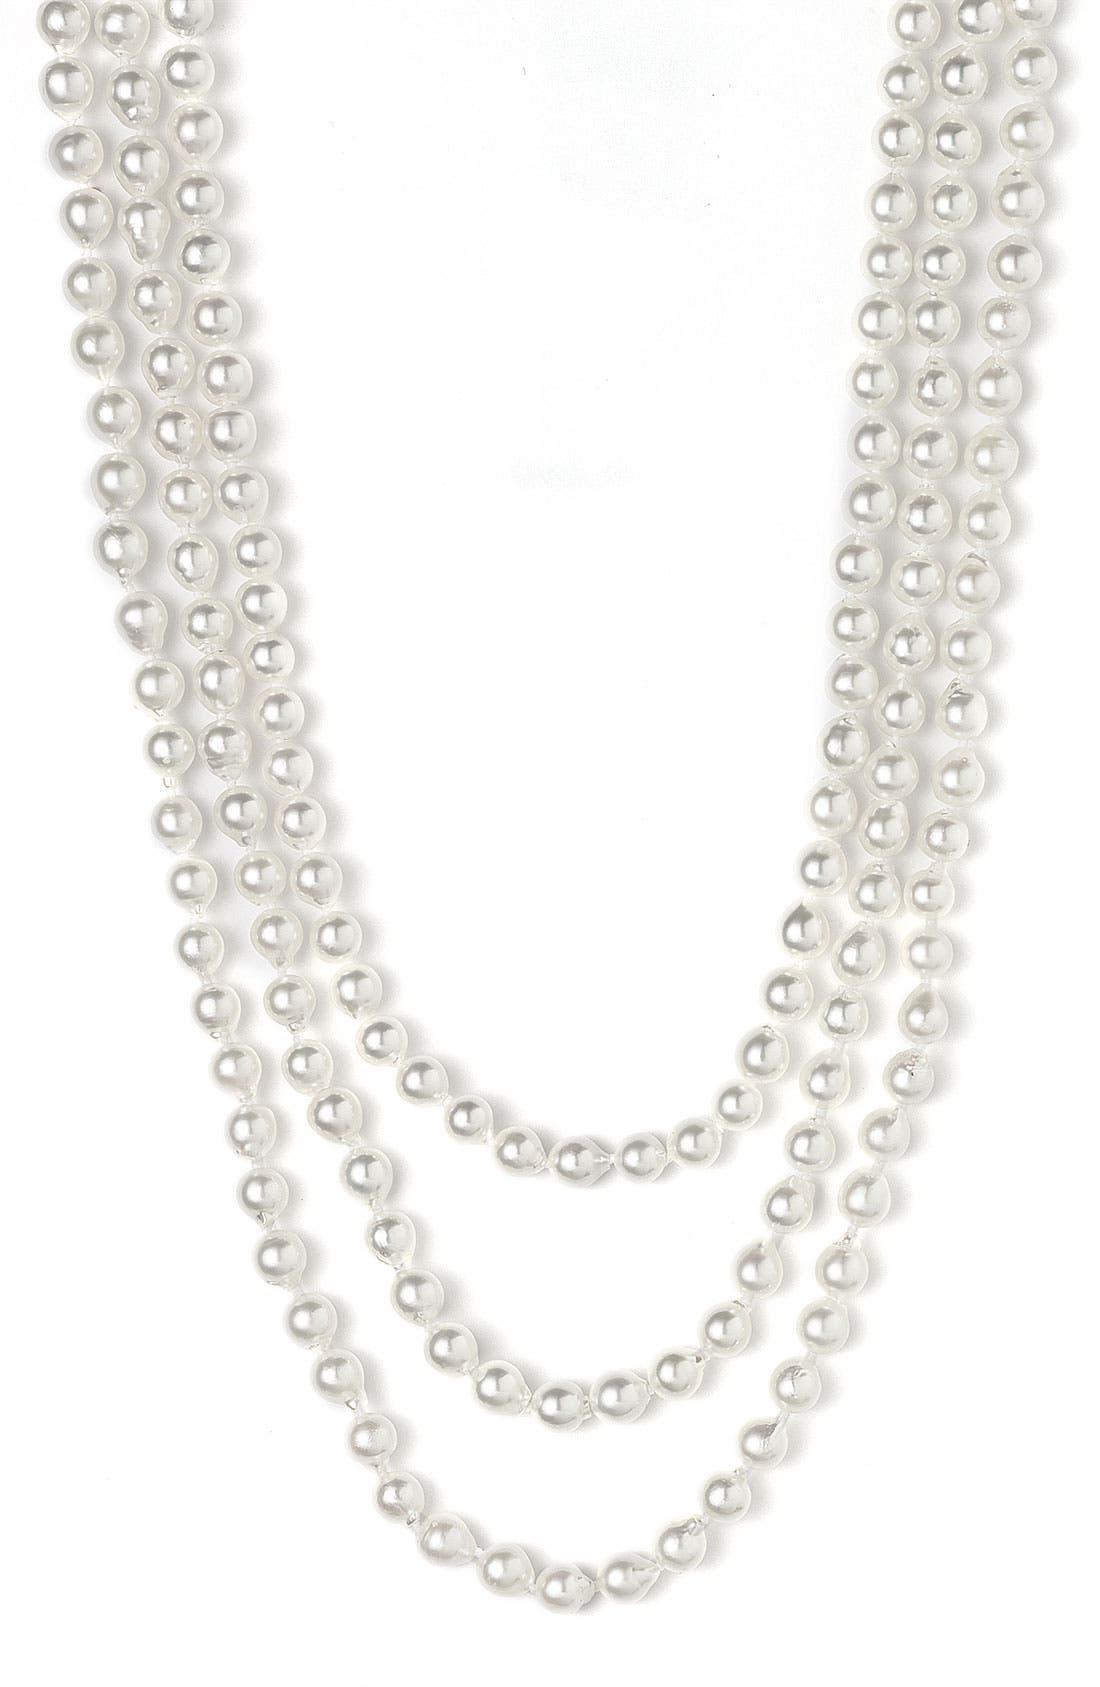 Alternate Image 1 Selected - Mastoloni Akoya 7mm Pearl Extra Long Strand Necklace